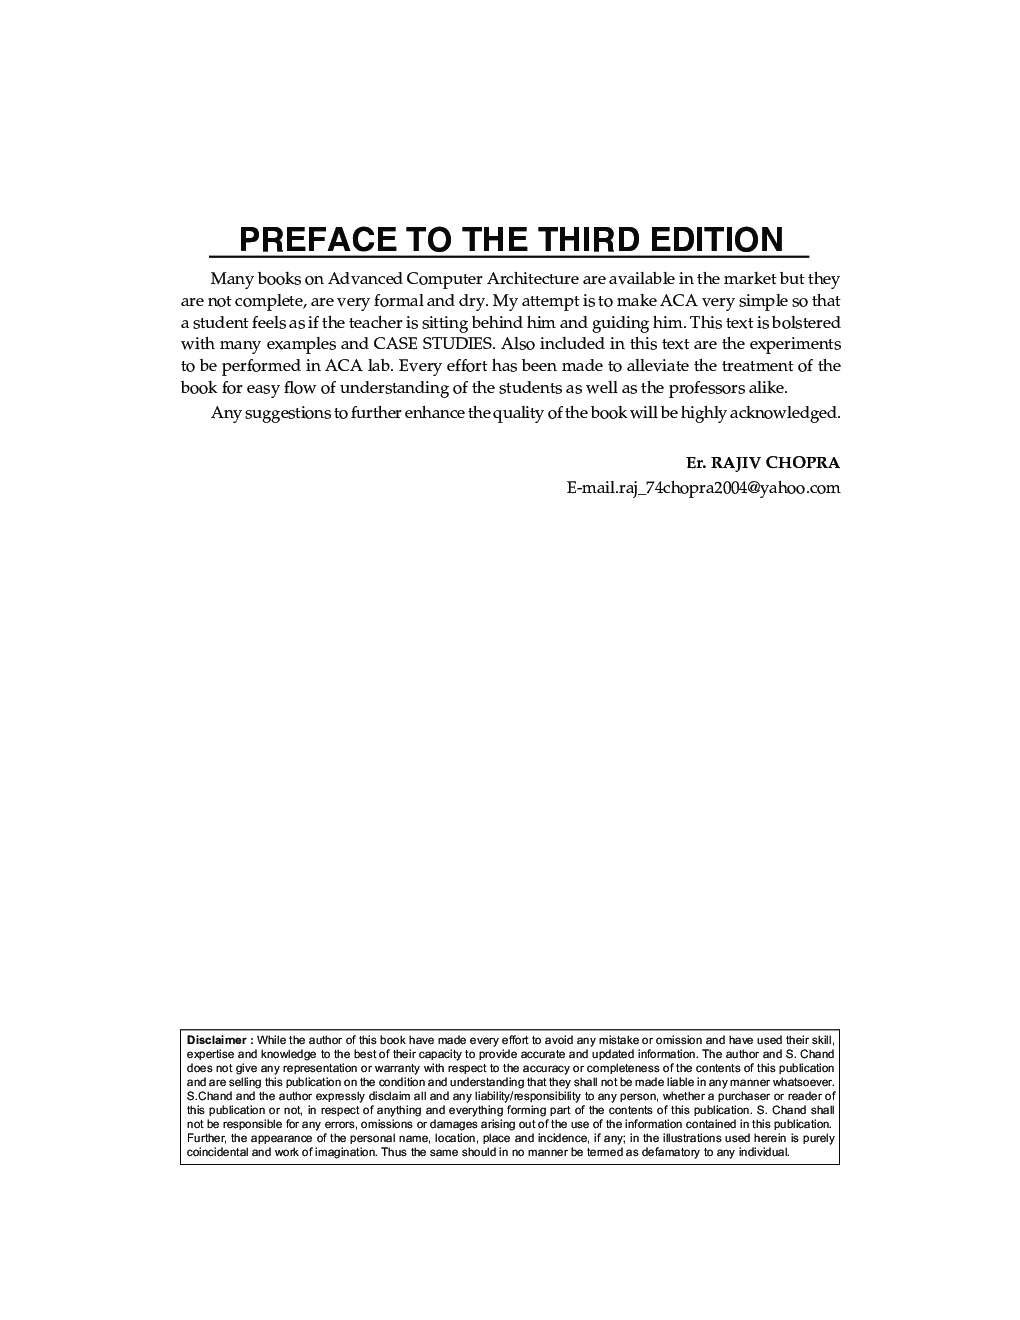 Advanced Computer Architecture - Hwang - Google Books